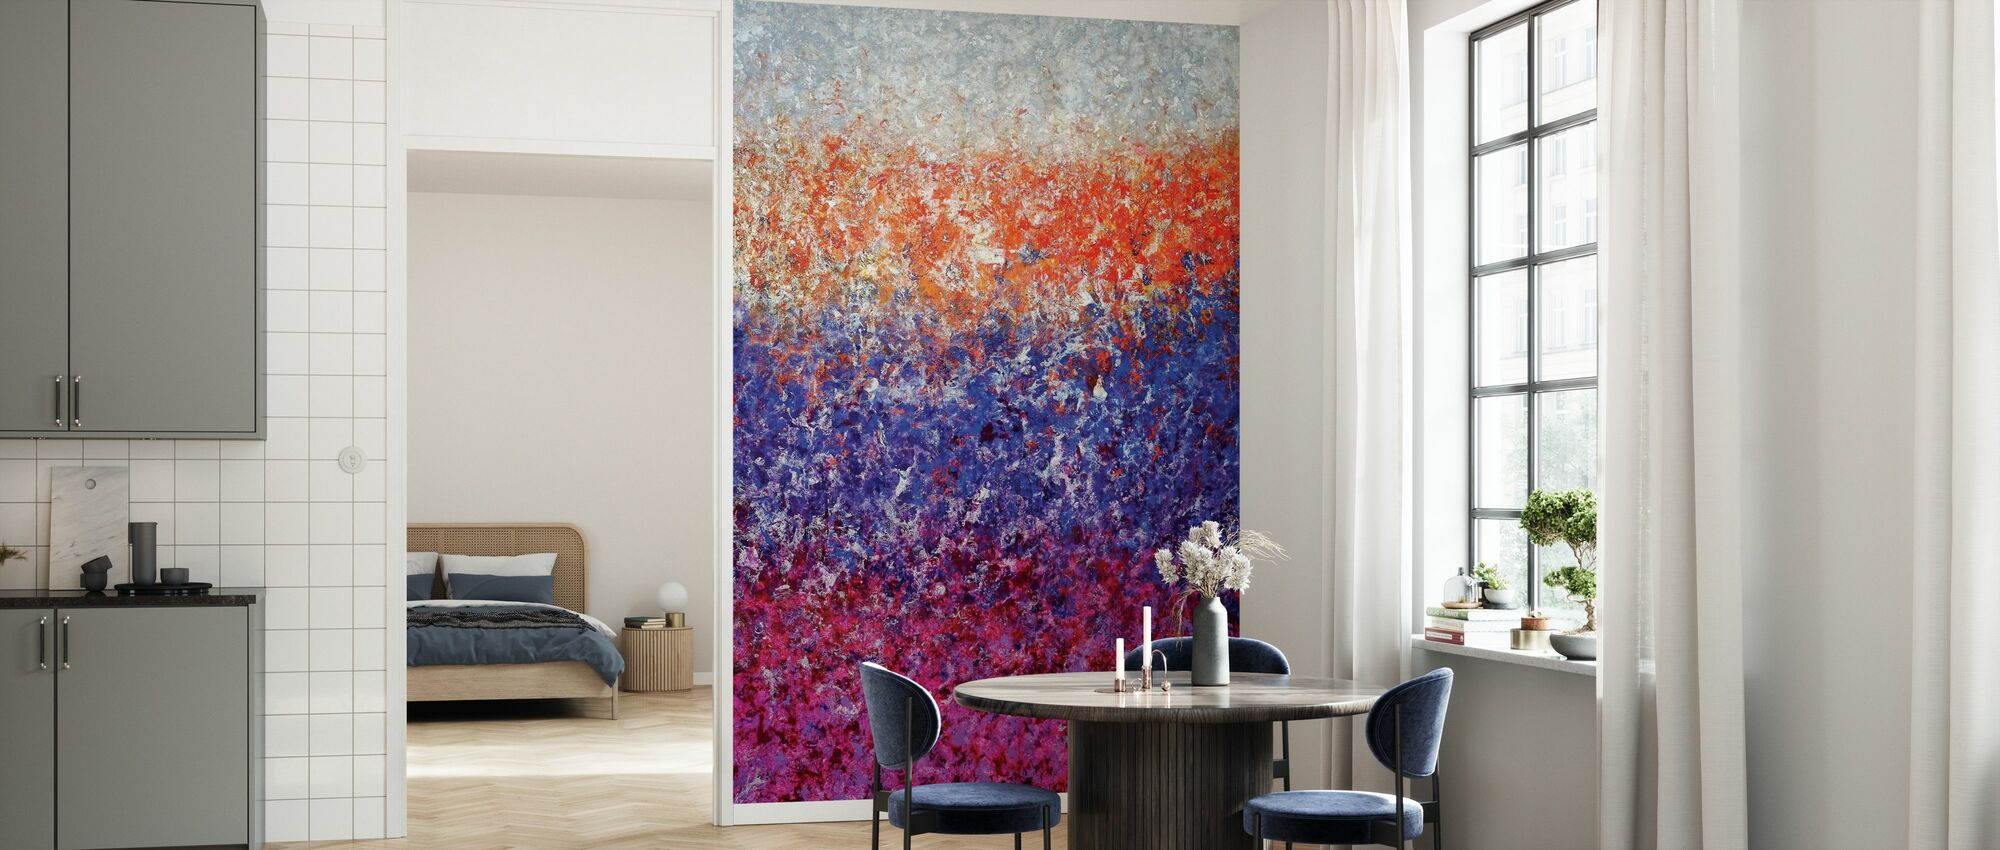 Dying Light - Wallpaper - Kitchen